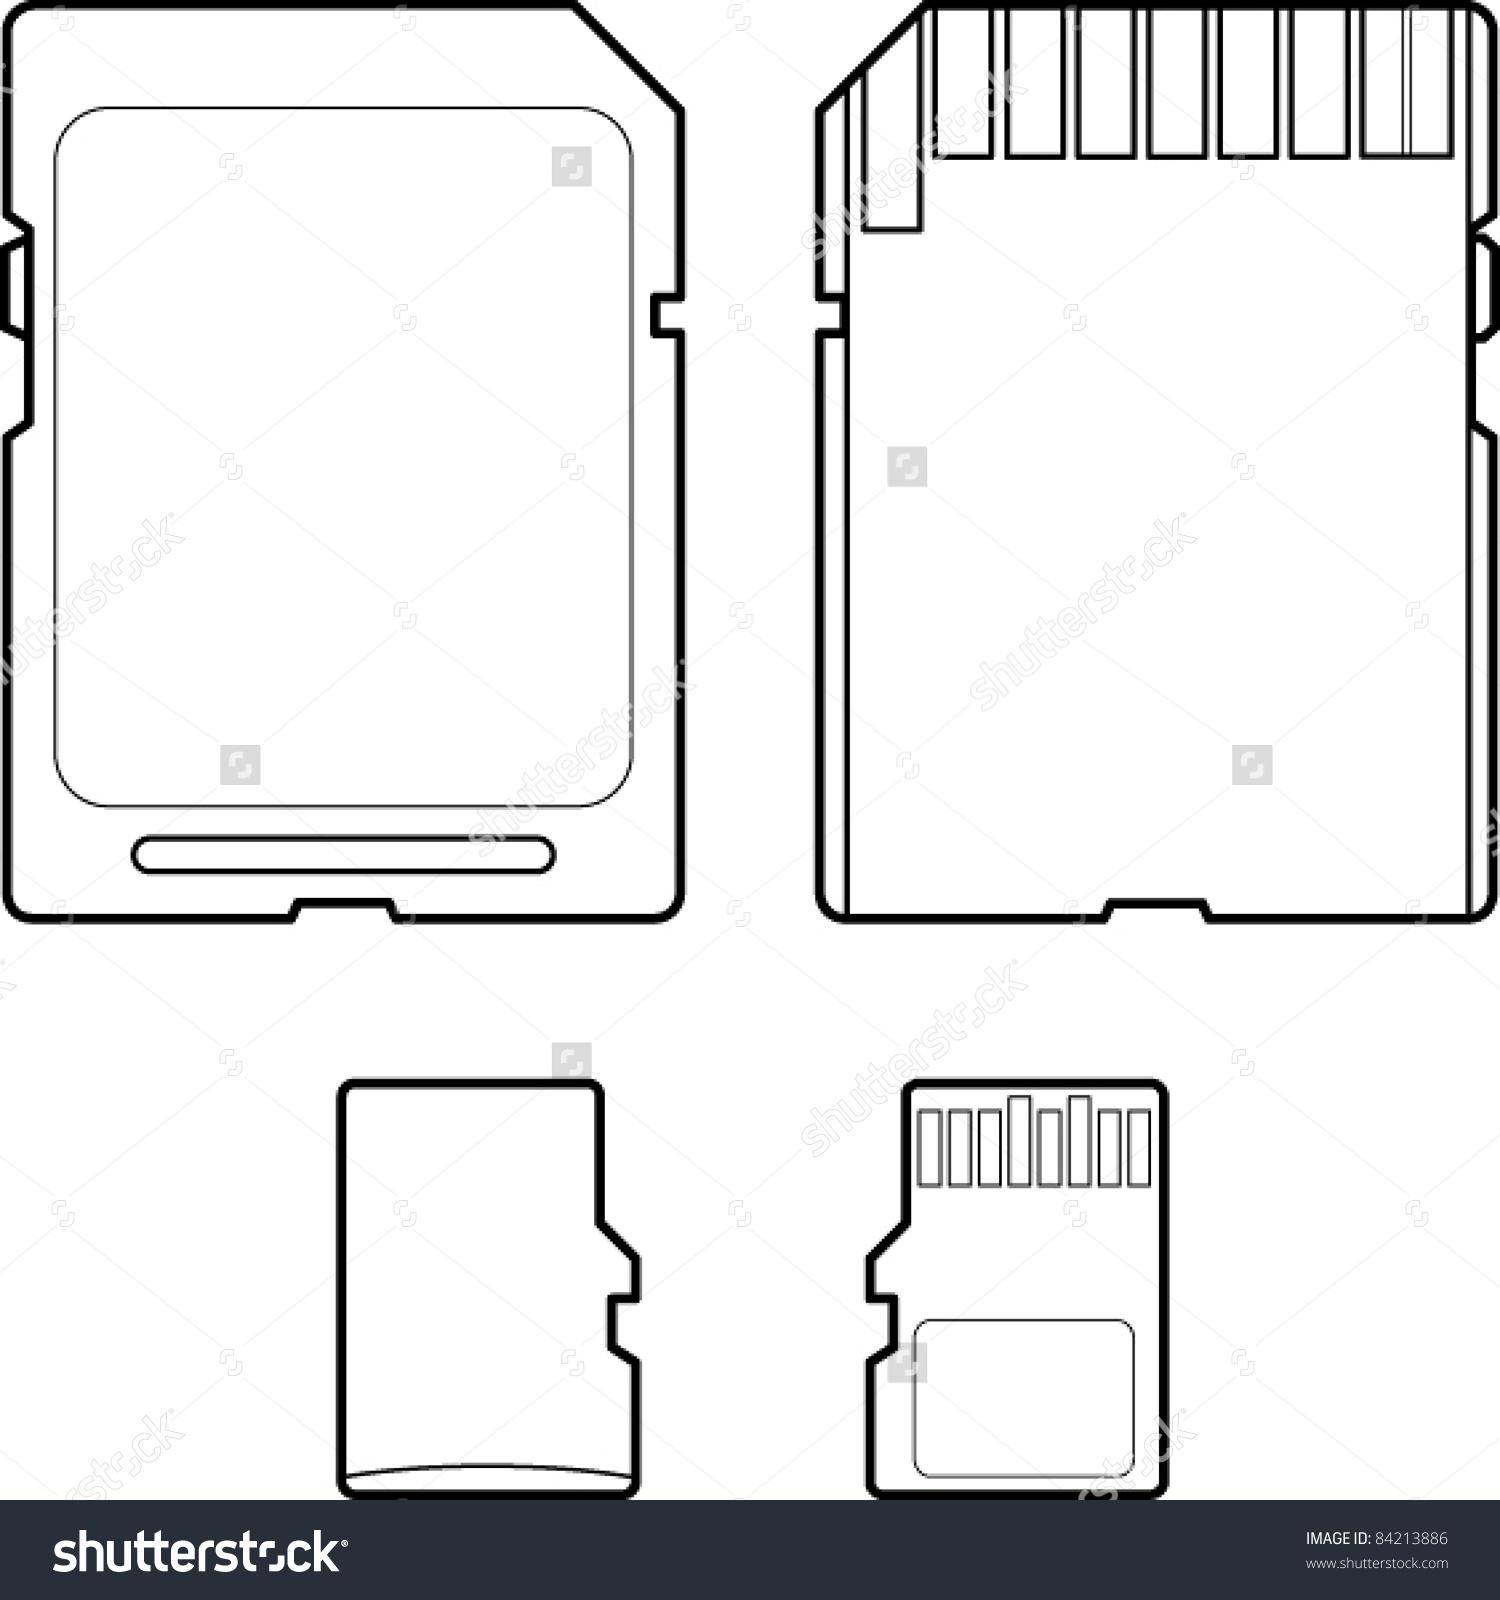 Secure Digital Micro Sd Flash Memory Stock Vector 84213886.